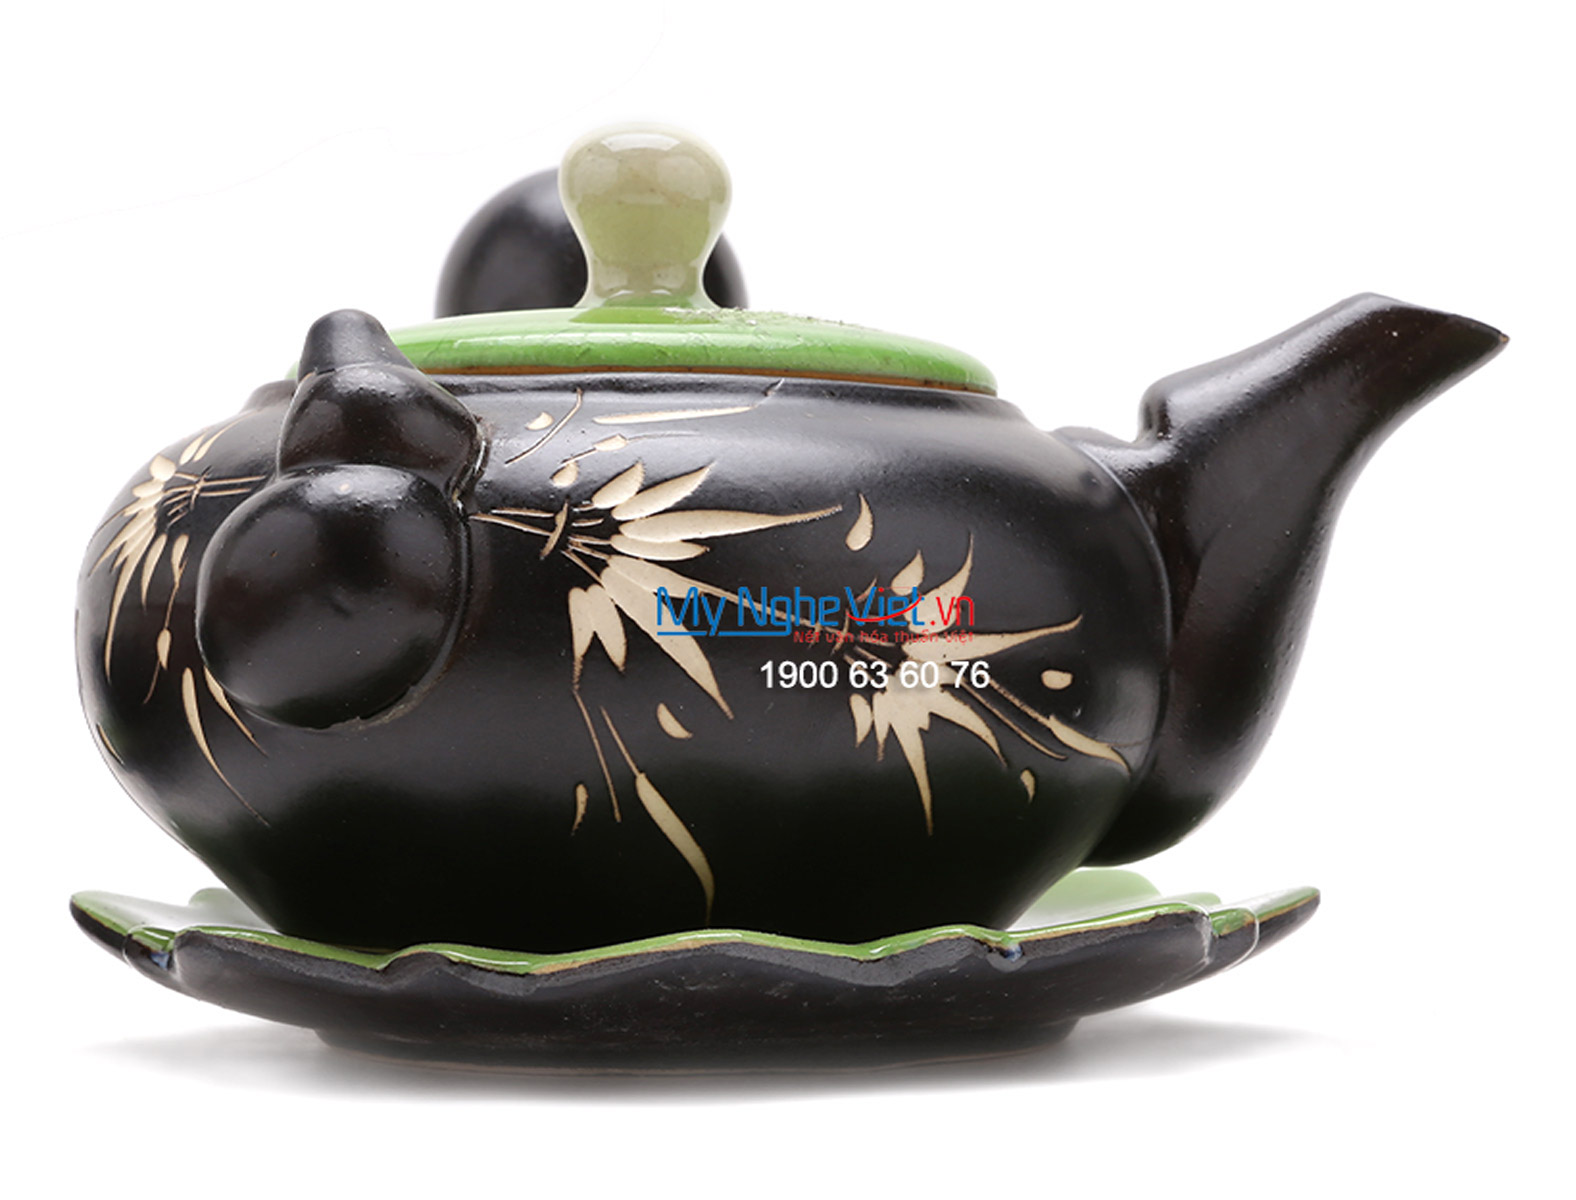 Bat Trang Tea set with Bamboo Pattern for Japanese Tea MNV-TS020